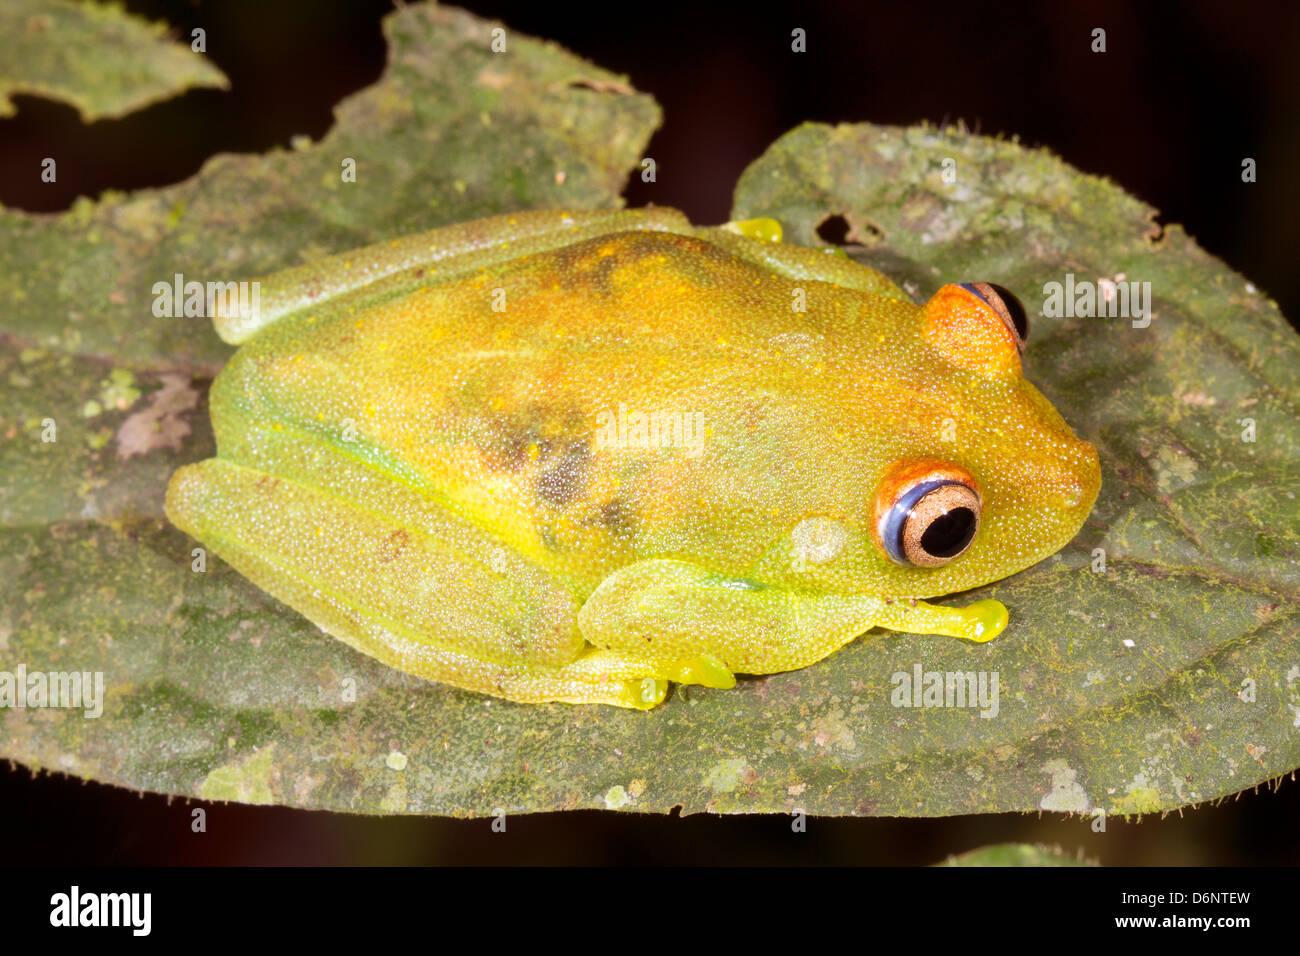 Rough Skinned Green Treefrog (Hypsiboas cinerascens) in the Ecuadorian Amazon - Stock Image